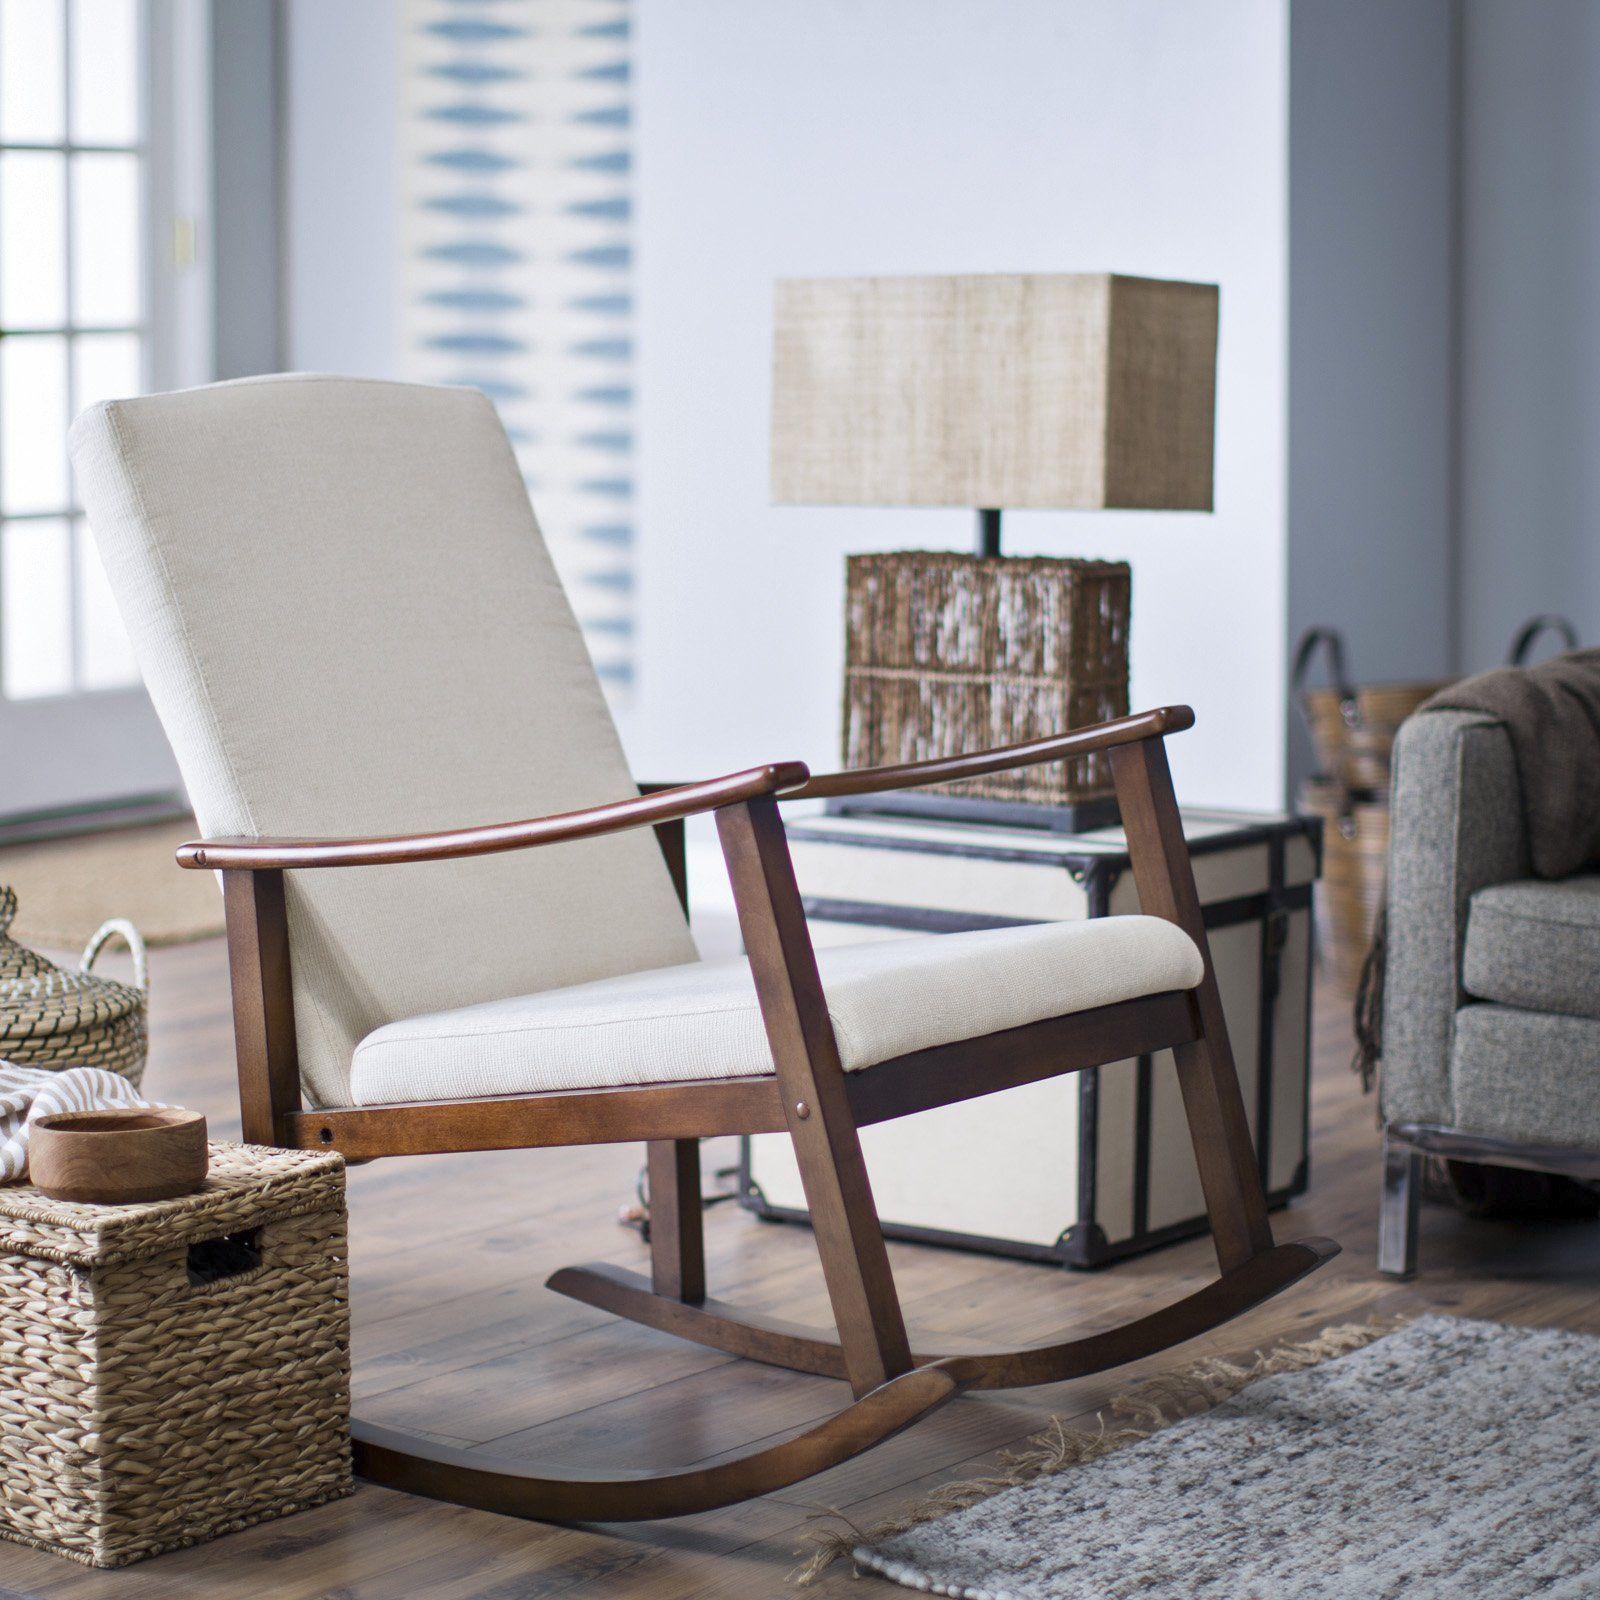 Belham Living Holden Modern Indoor Rocking Chair